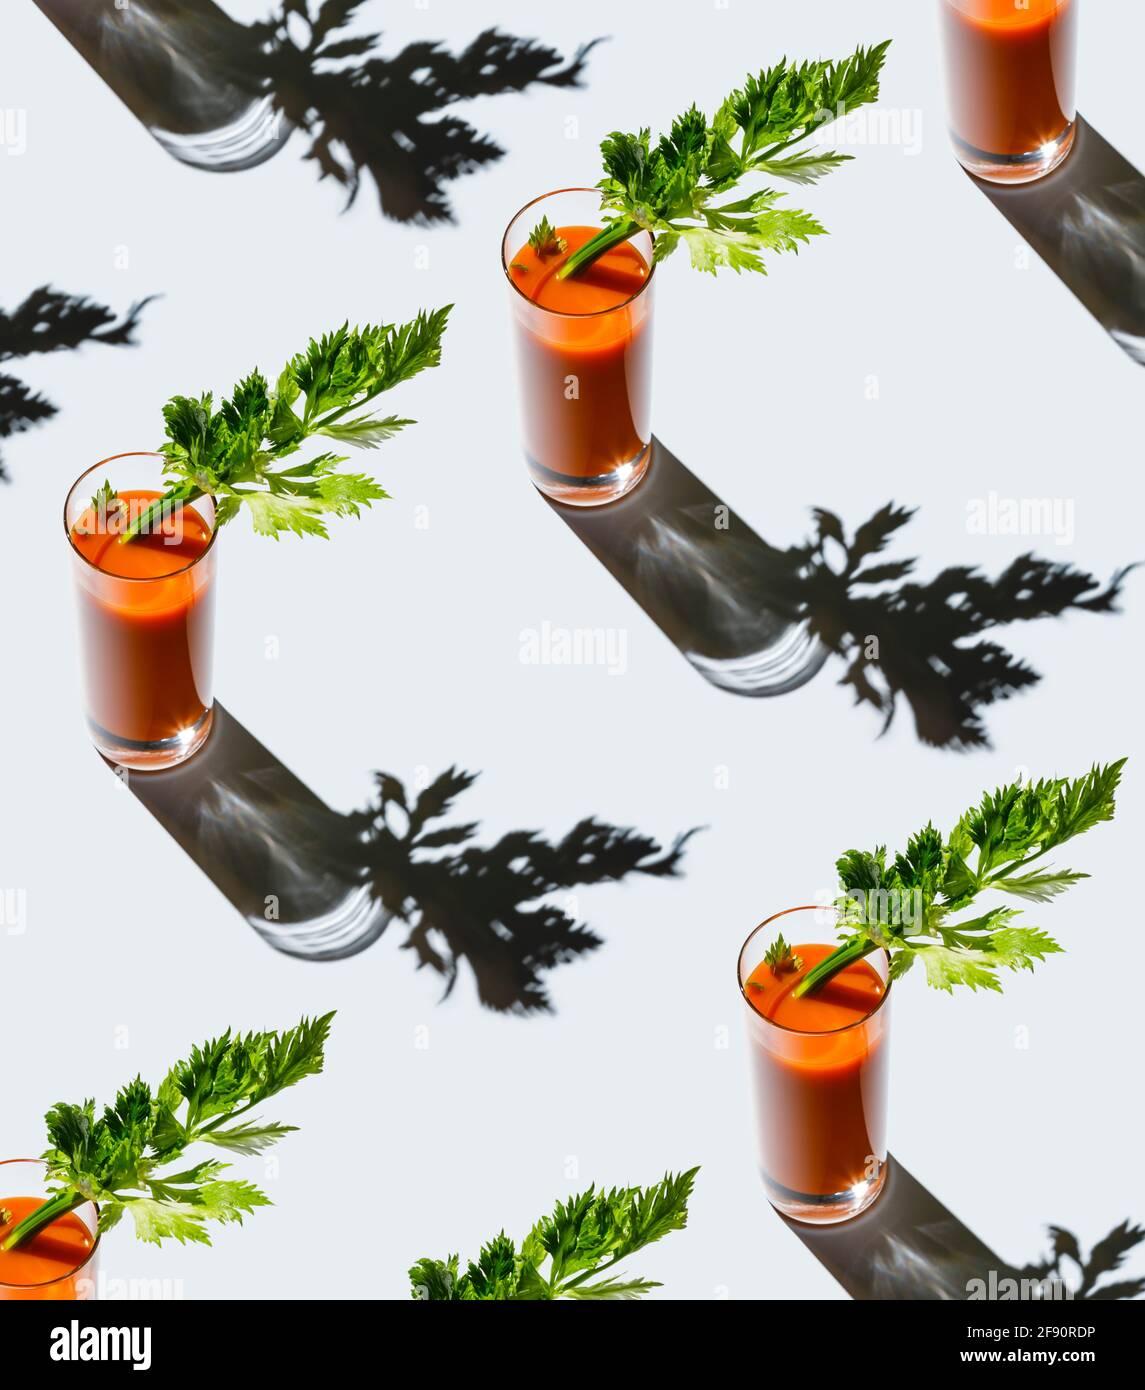 Jugo de zanahoria con apio sobre fondo gris Patrón Foto de stock